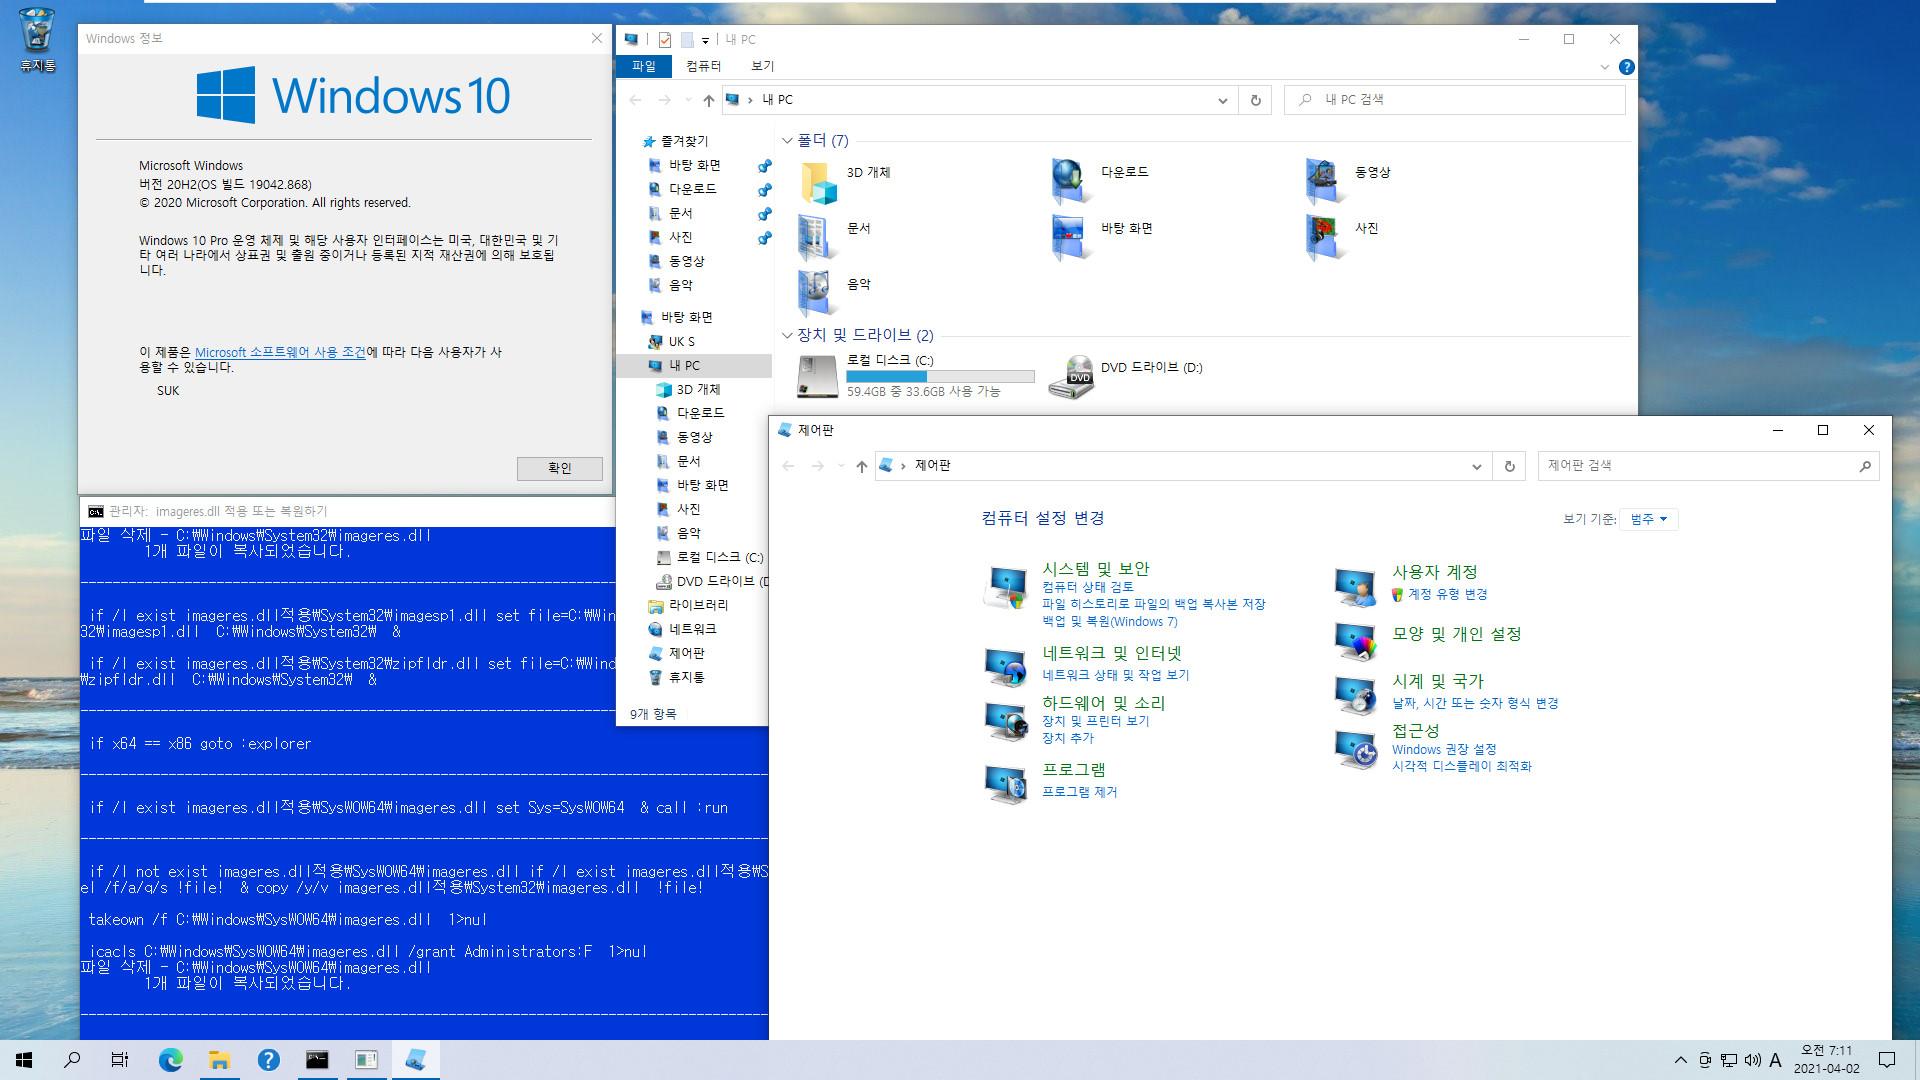 imageres.dll 2개를 합친 파일 테스트 - 윈도우 10 버전 20H2와 버전 1903과 버전 1809와 윈도우 7에서는 재부팅 통과 2021-04-02_071104.jpg